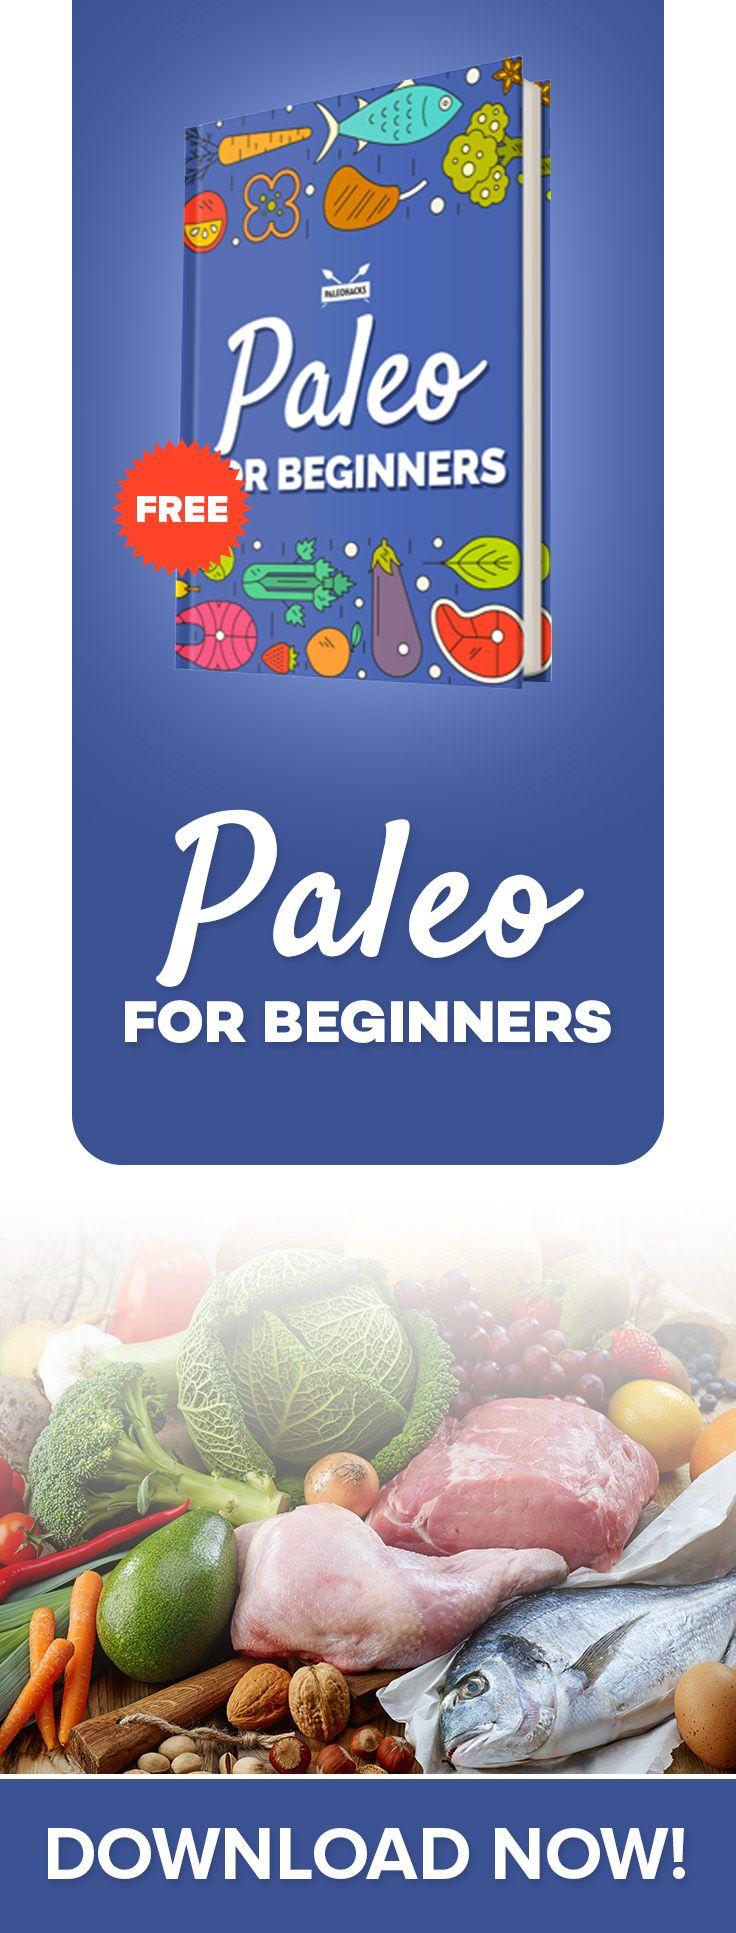 28 Best Free Paleo Ebooks Cookbooks Images On Pinterest Charts